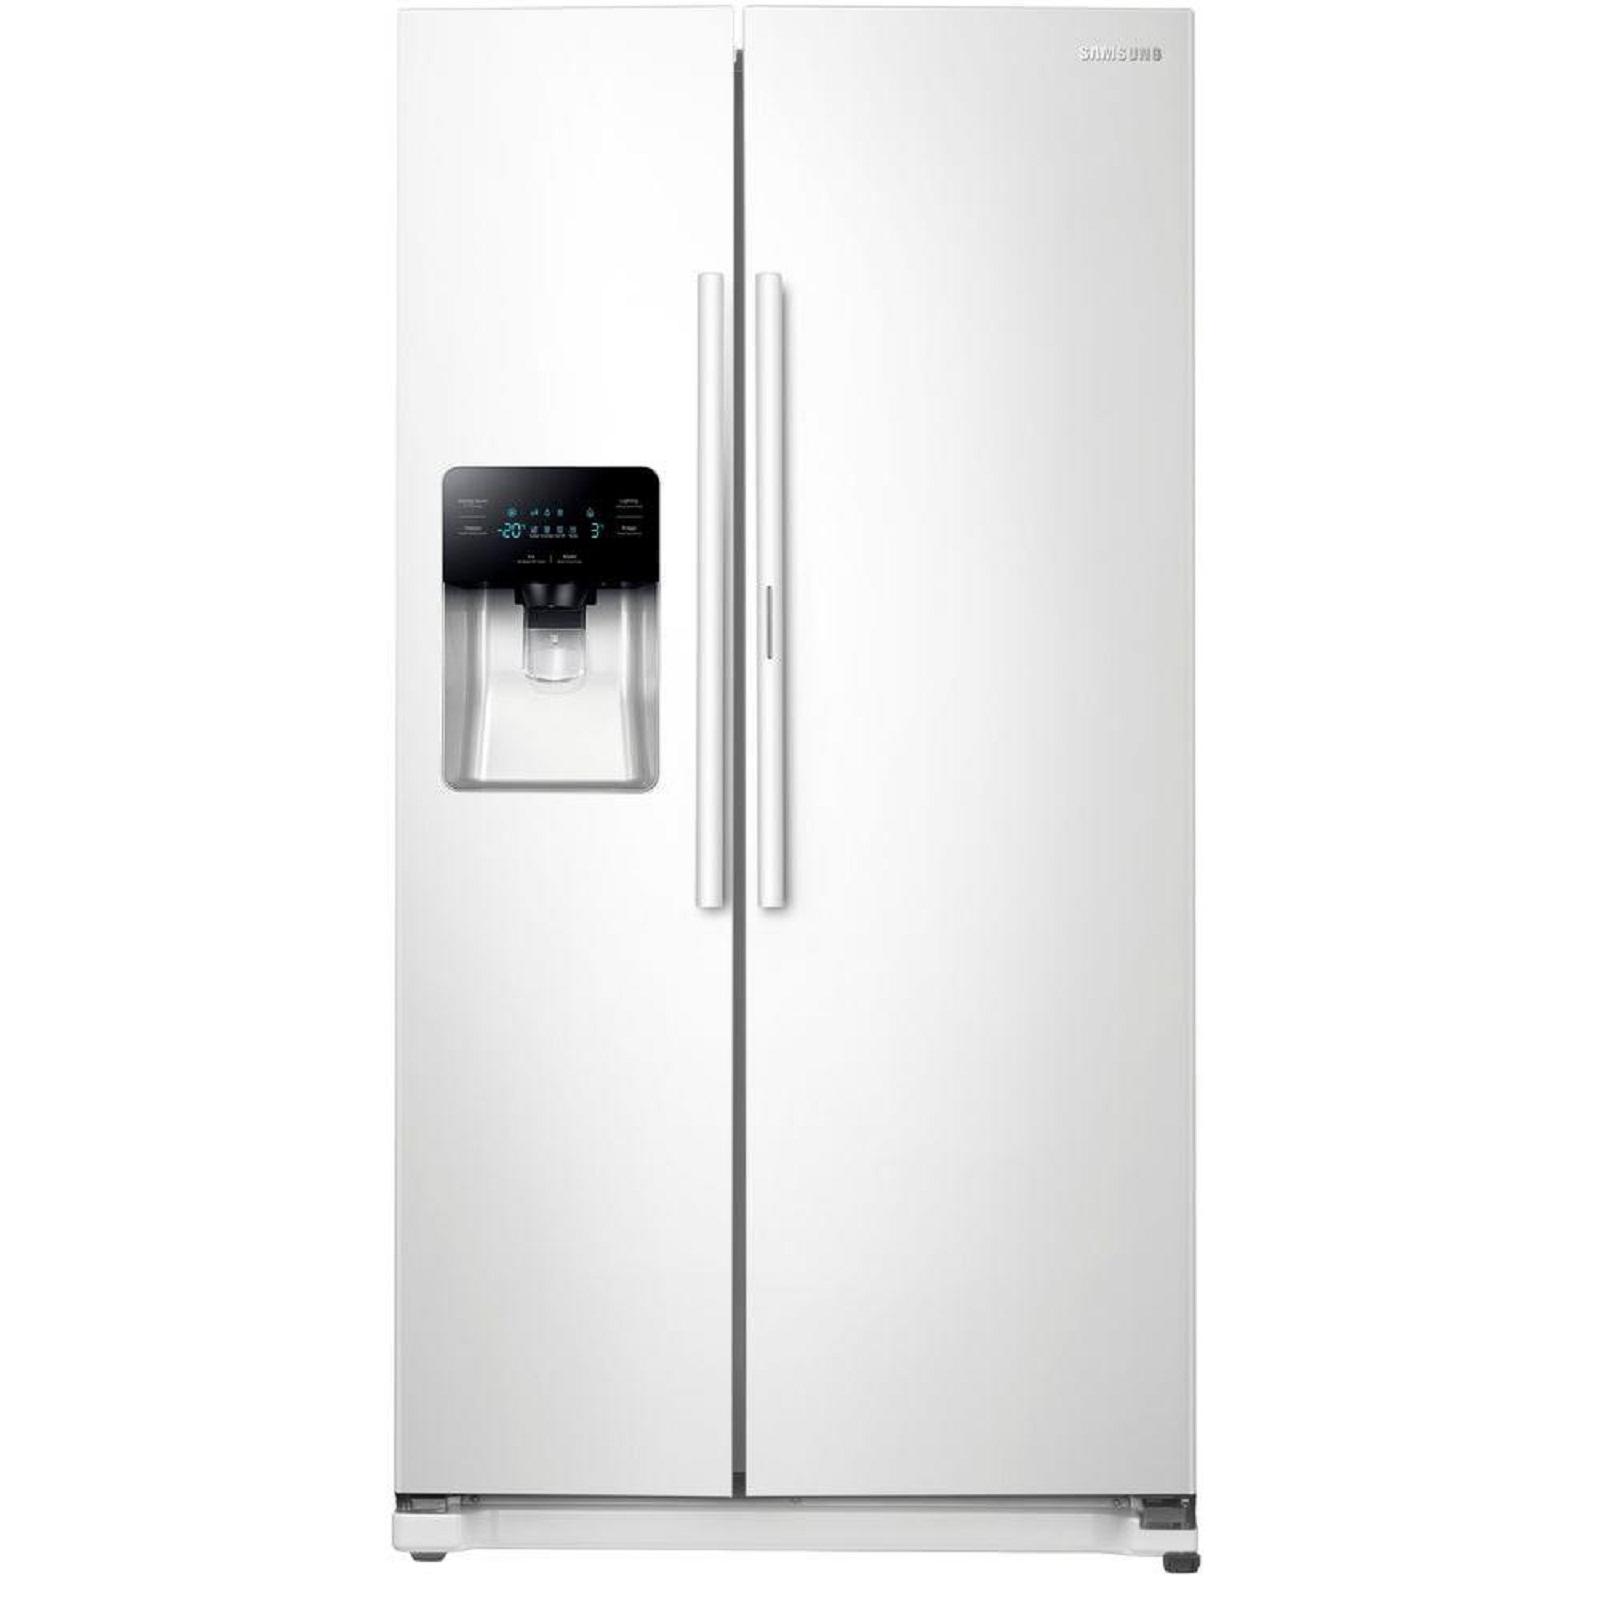 Samsung Samsung 24.7 cu. ft. Side by Side Refrigerator  with Food Showcase Design